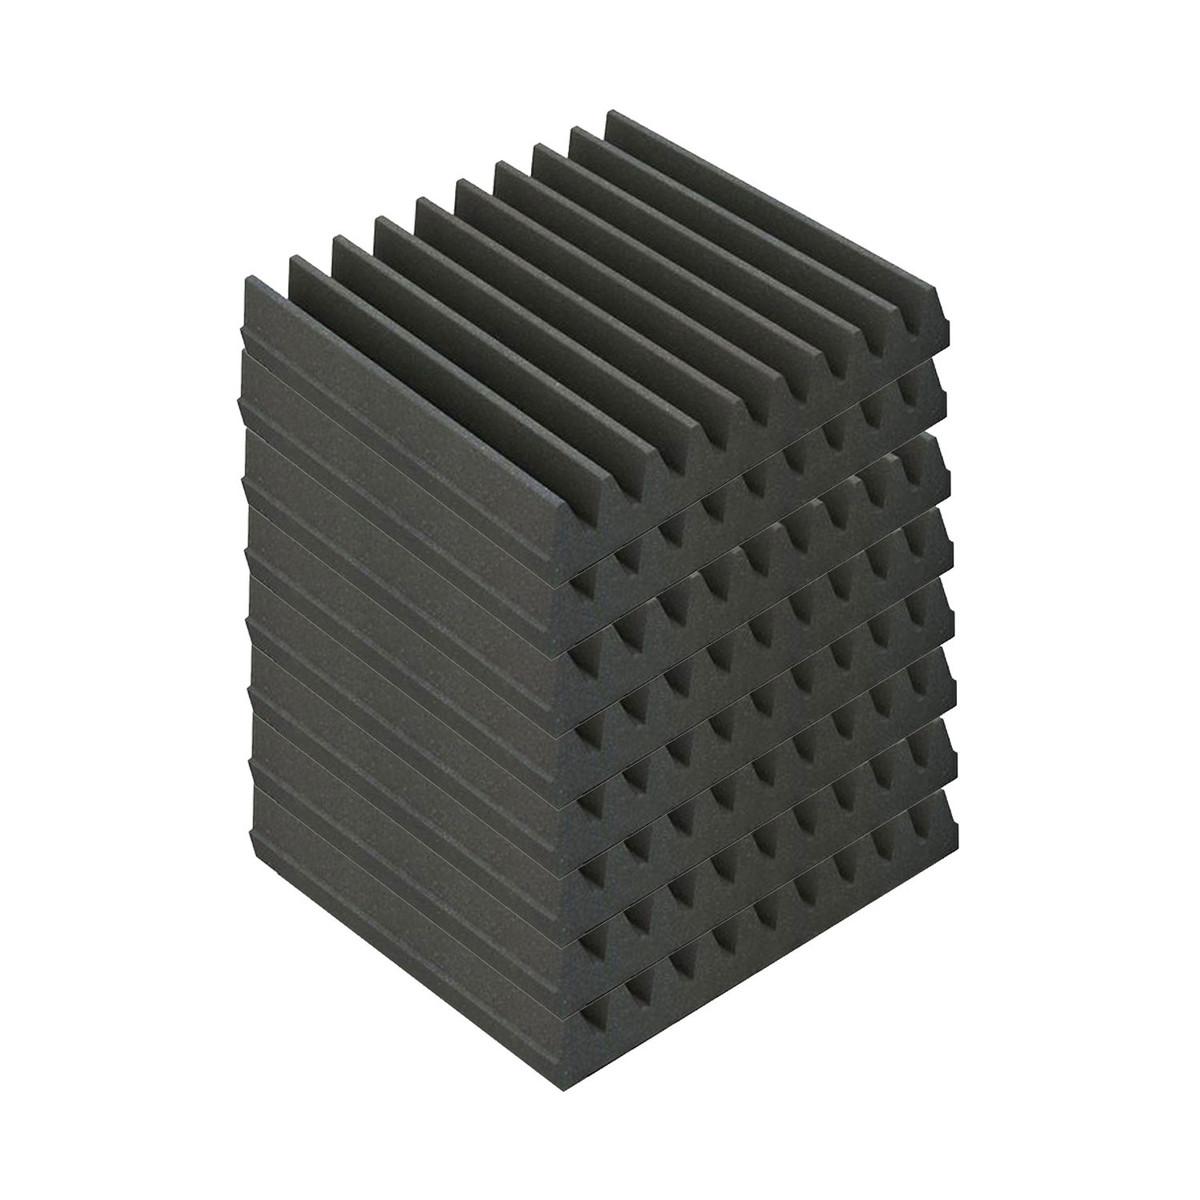 Image of EQ Acoustics Classic Wedge 30 30cm Foam Tiles Grey (8 Pack)